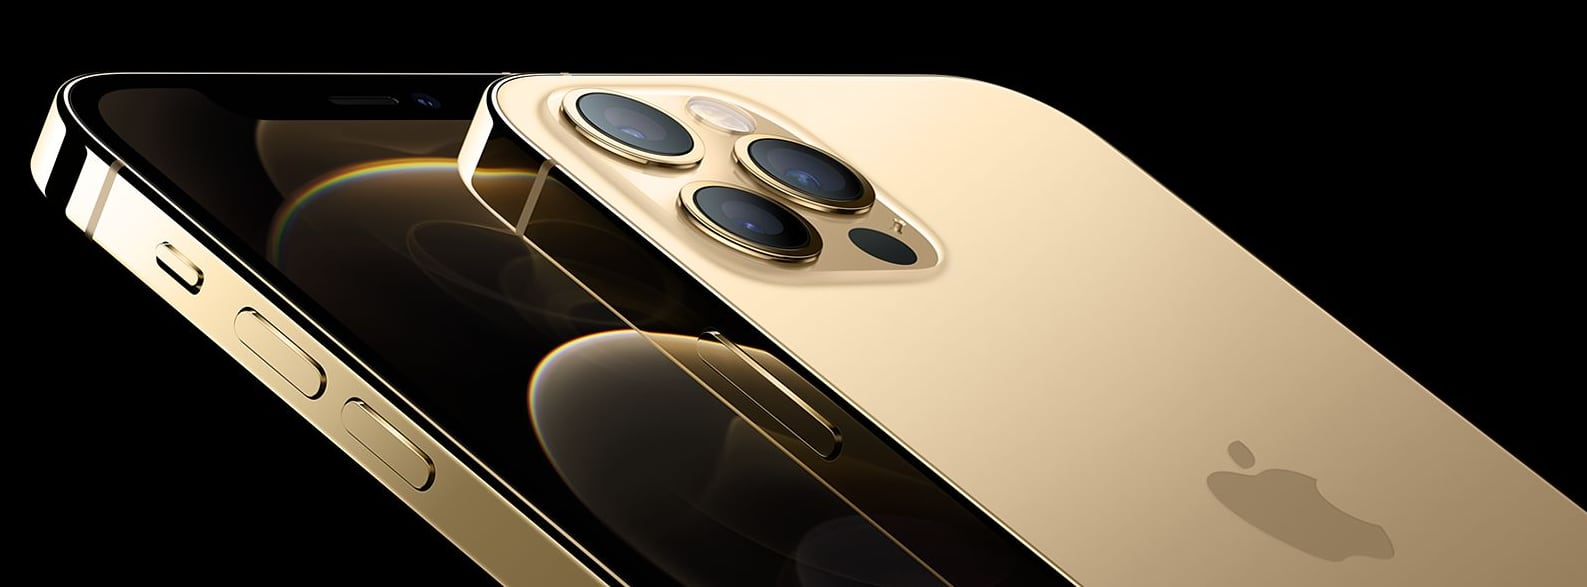 iphone12procamera